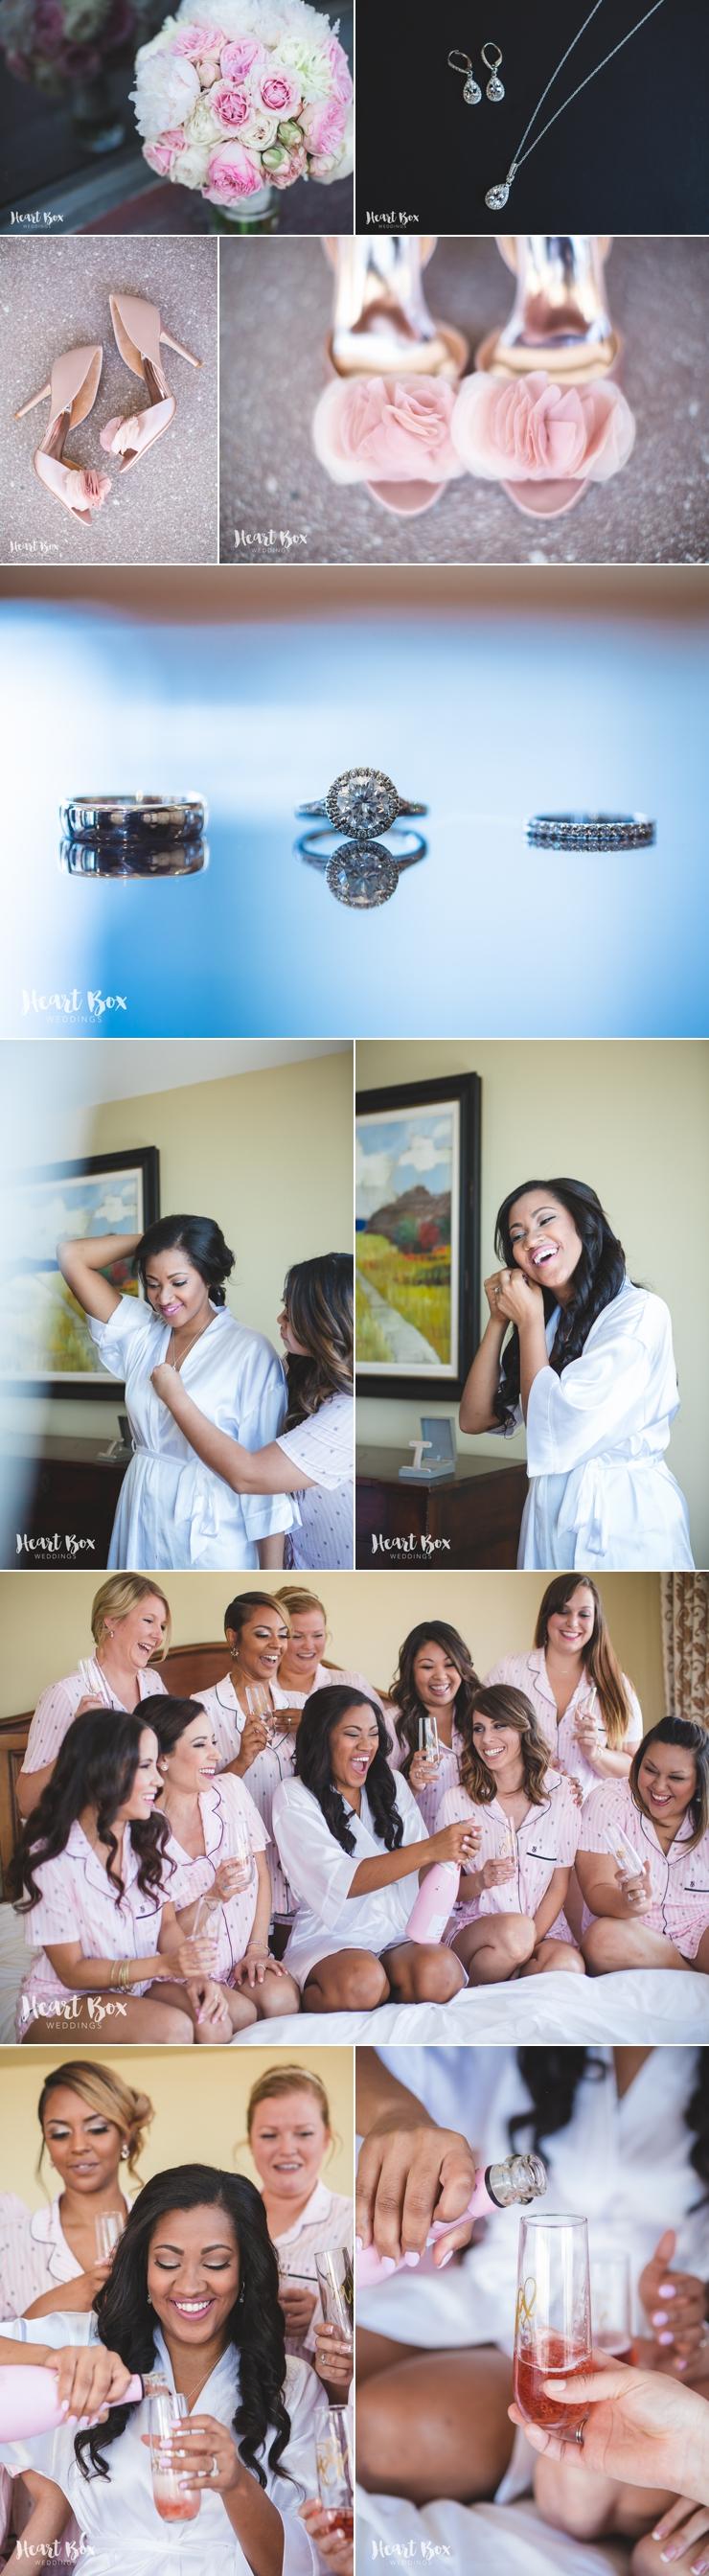 Smith Wedding Blog Collages 1.jpg